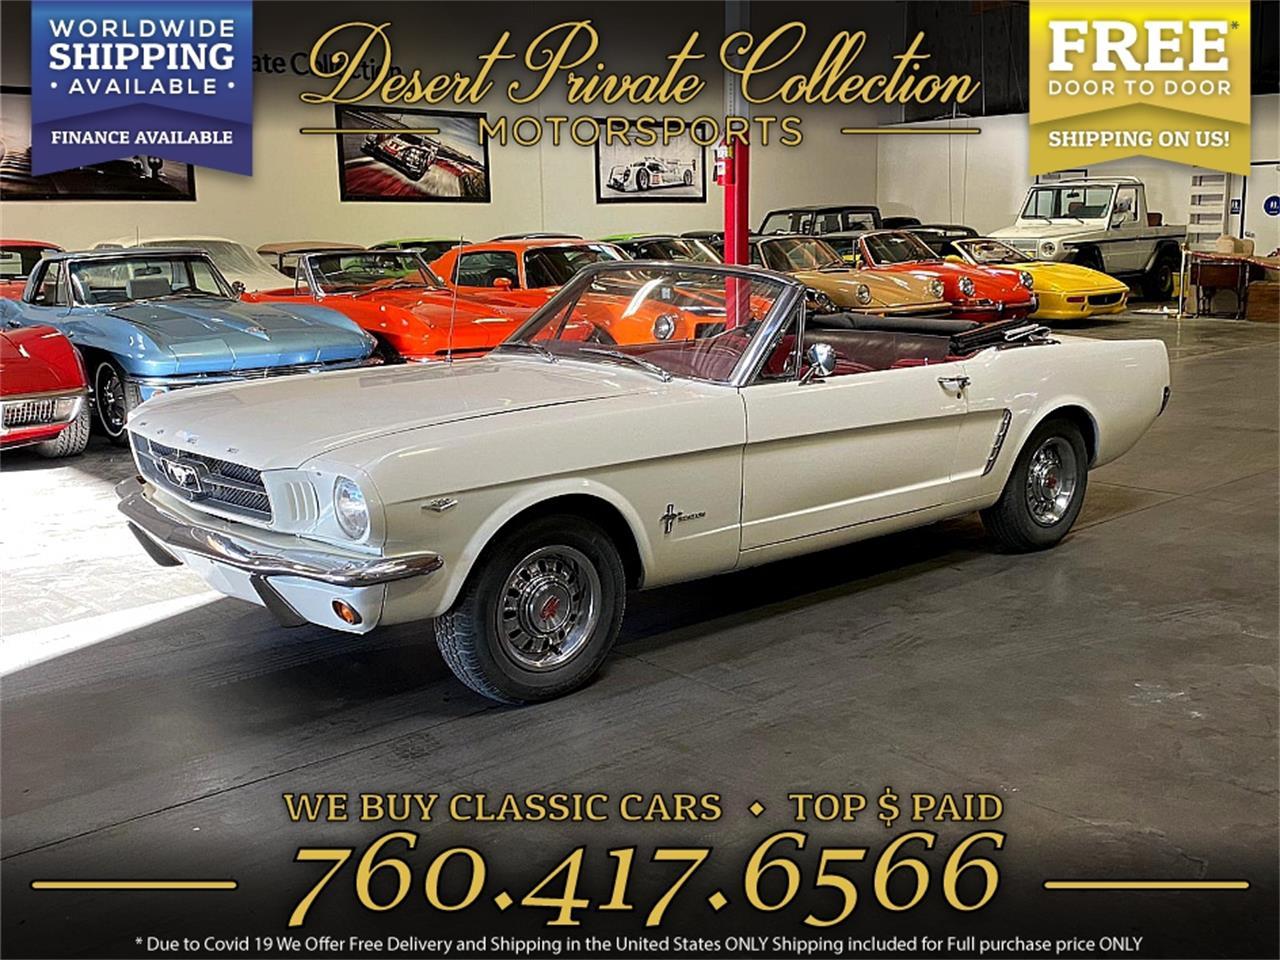 Ford Mustang V8 289 1965prix tout compris 1965